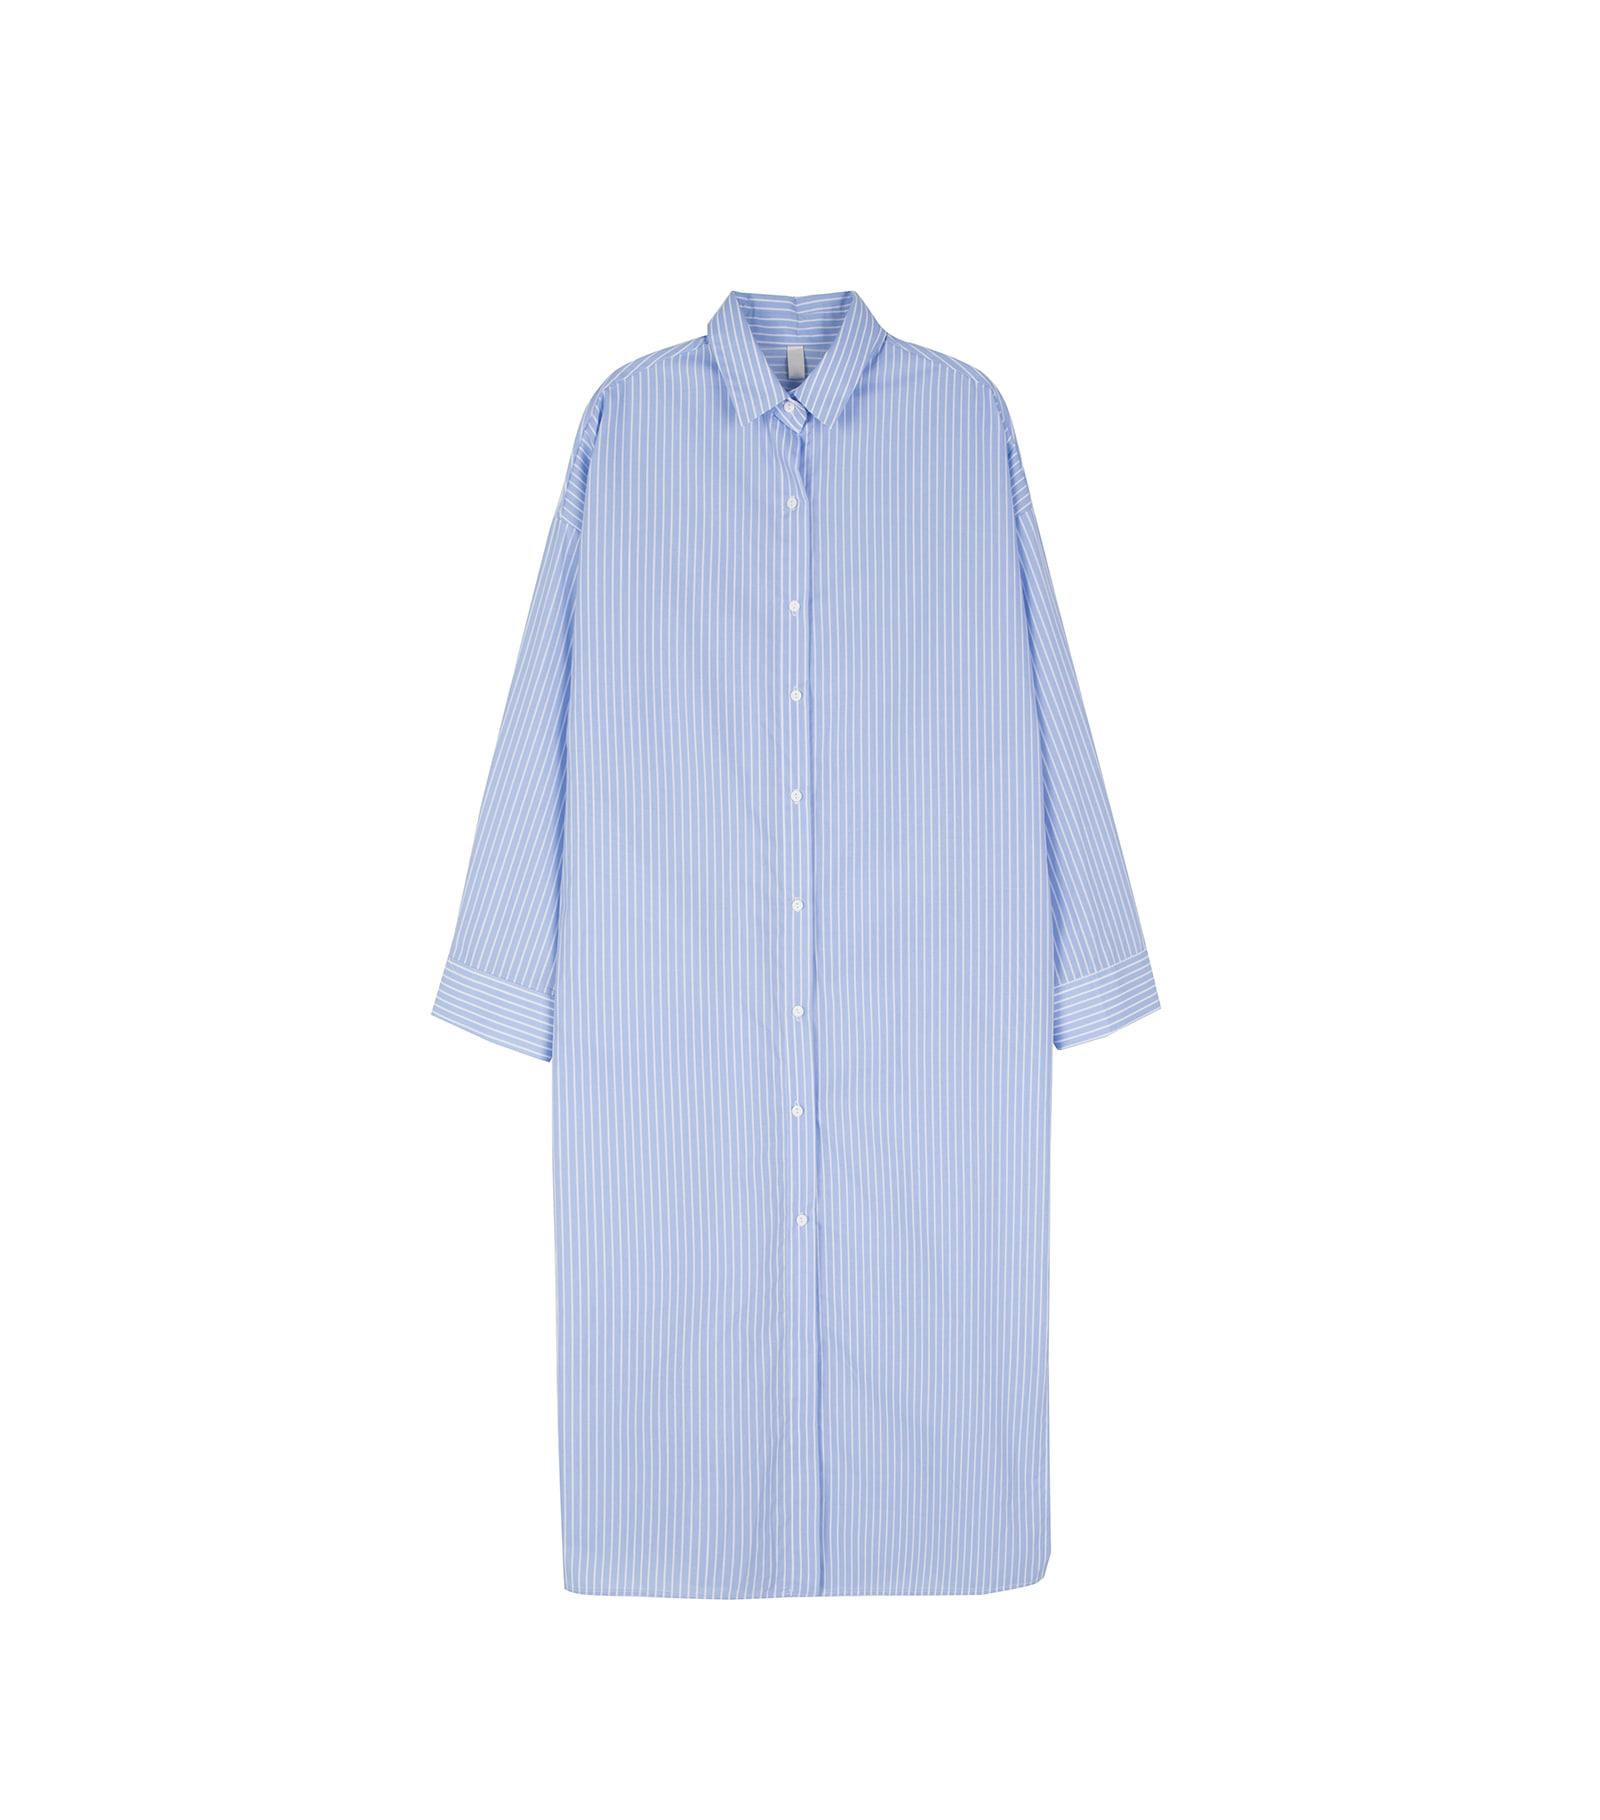 Saint striped shirt maxi dress